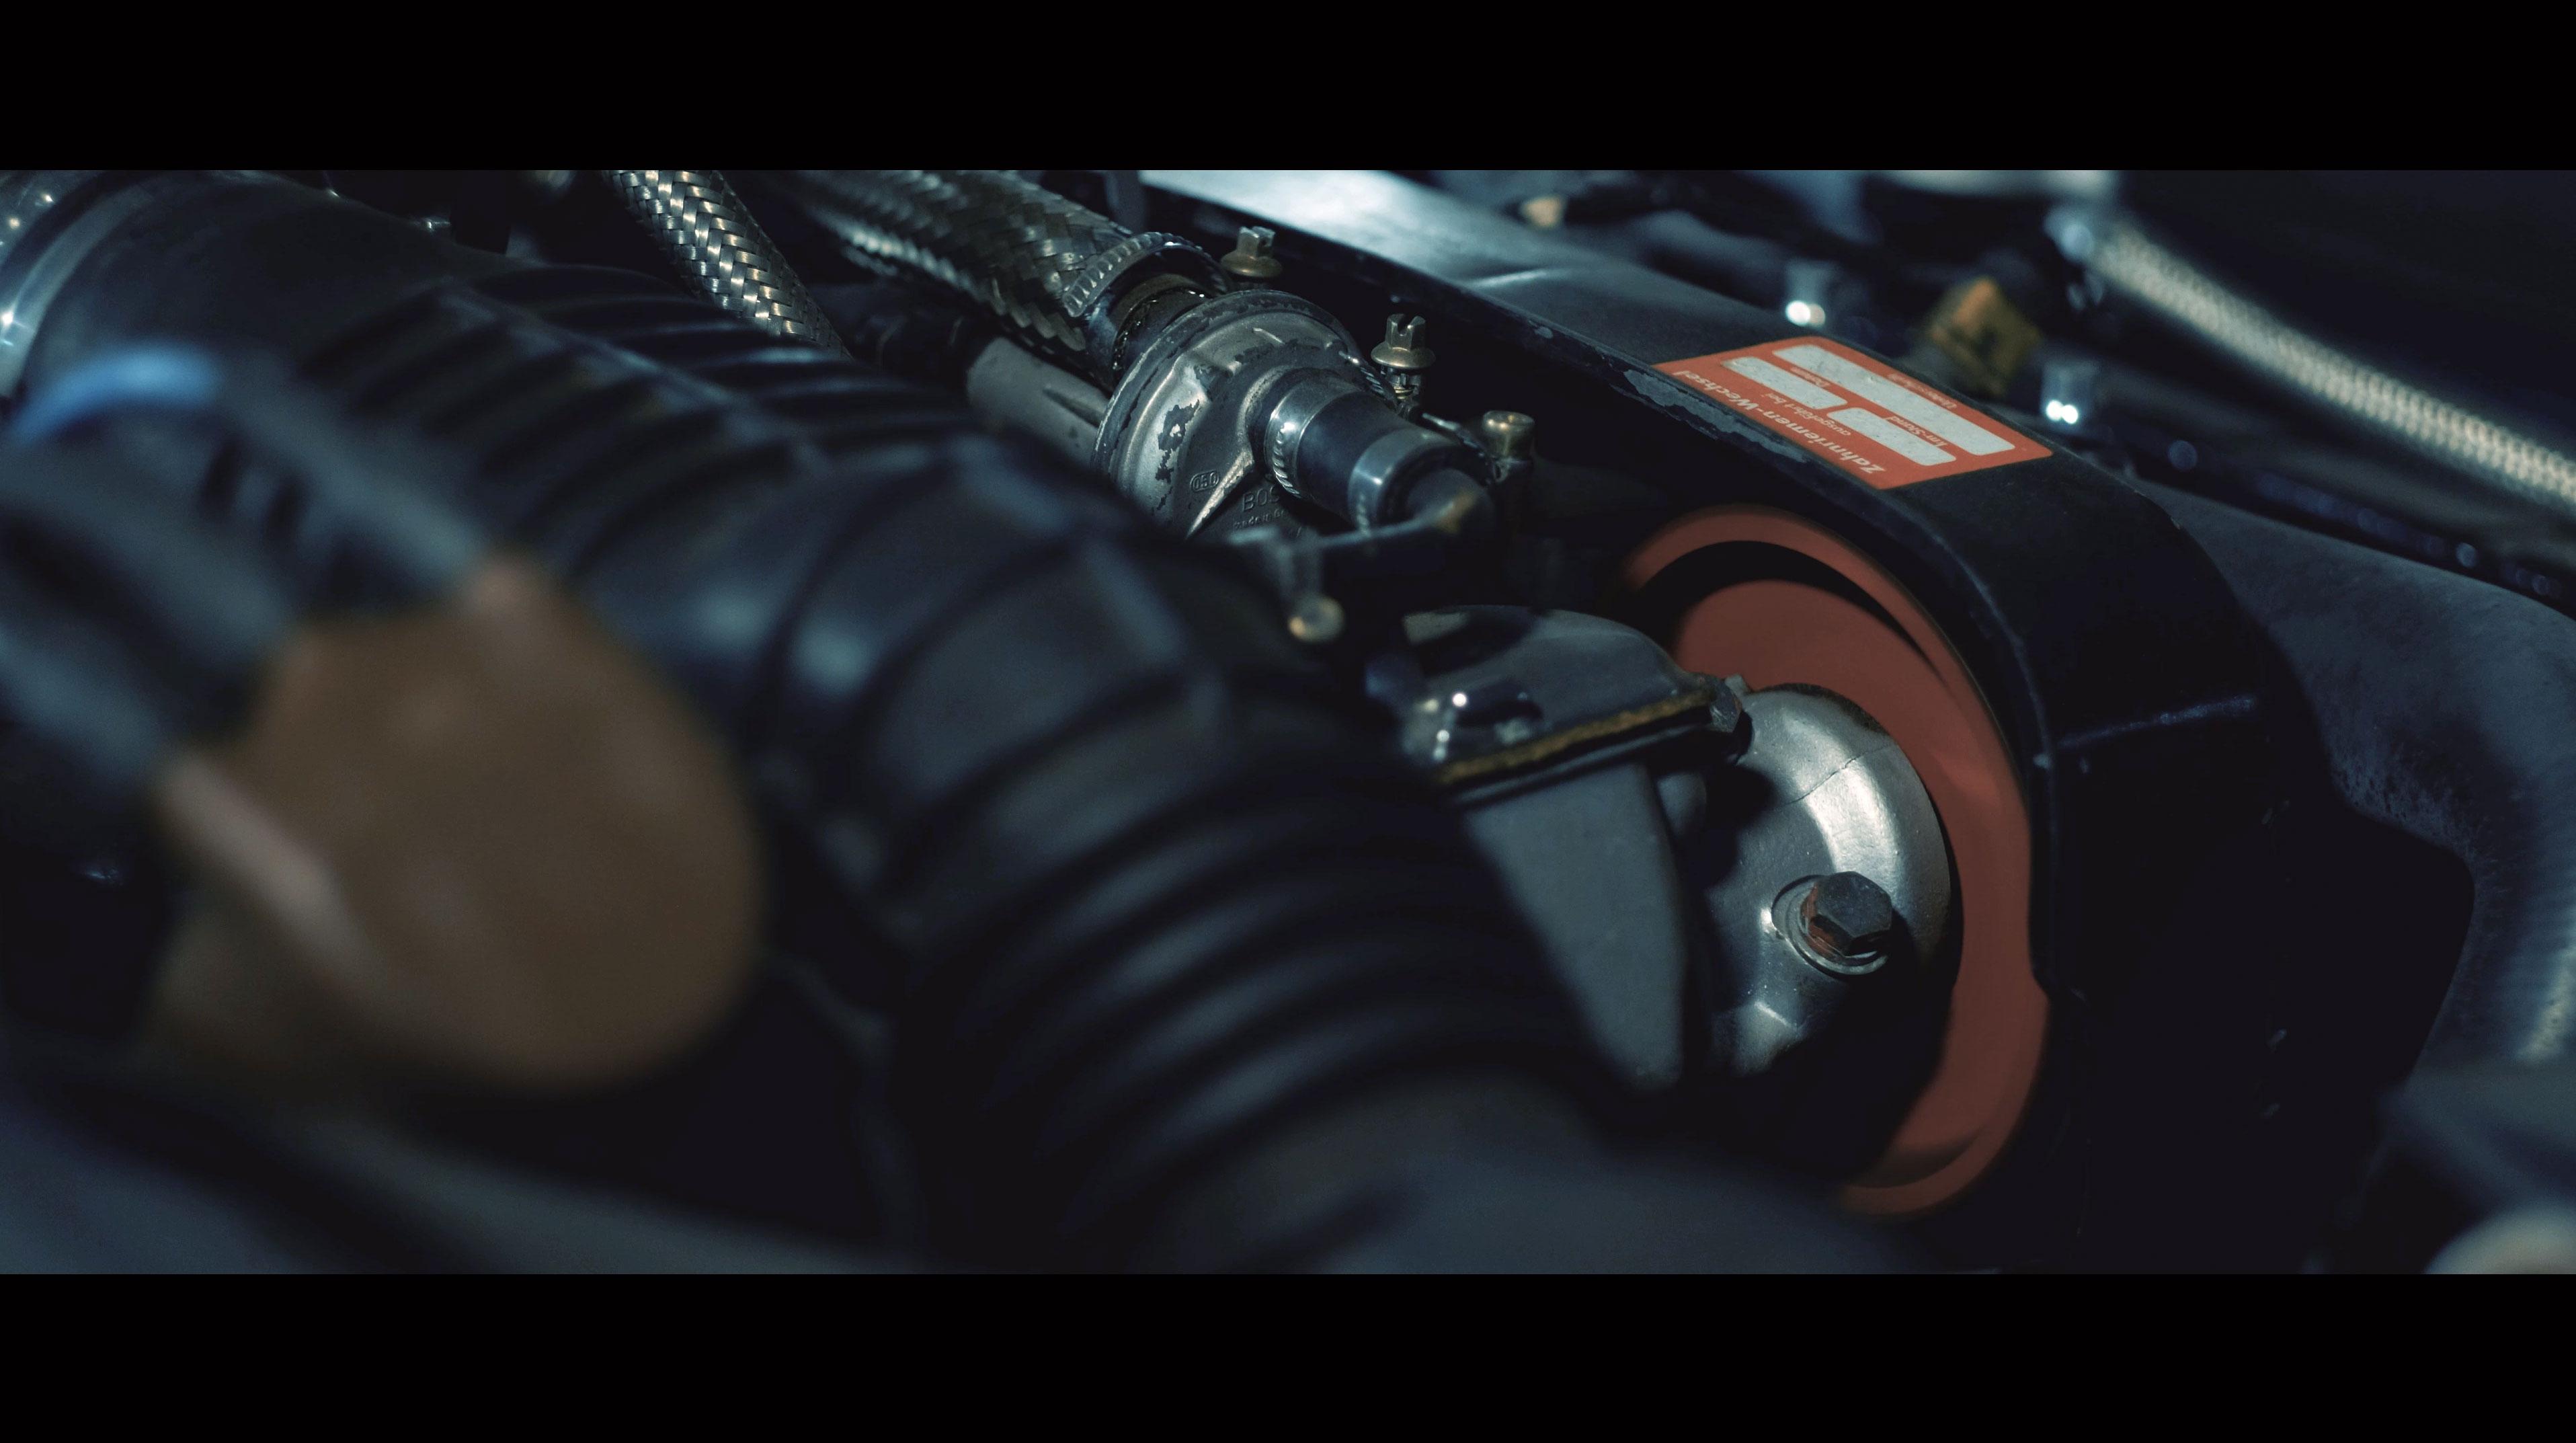 Fiat 124 Spider Foto Produktion MIND FABRIC